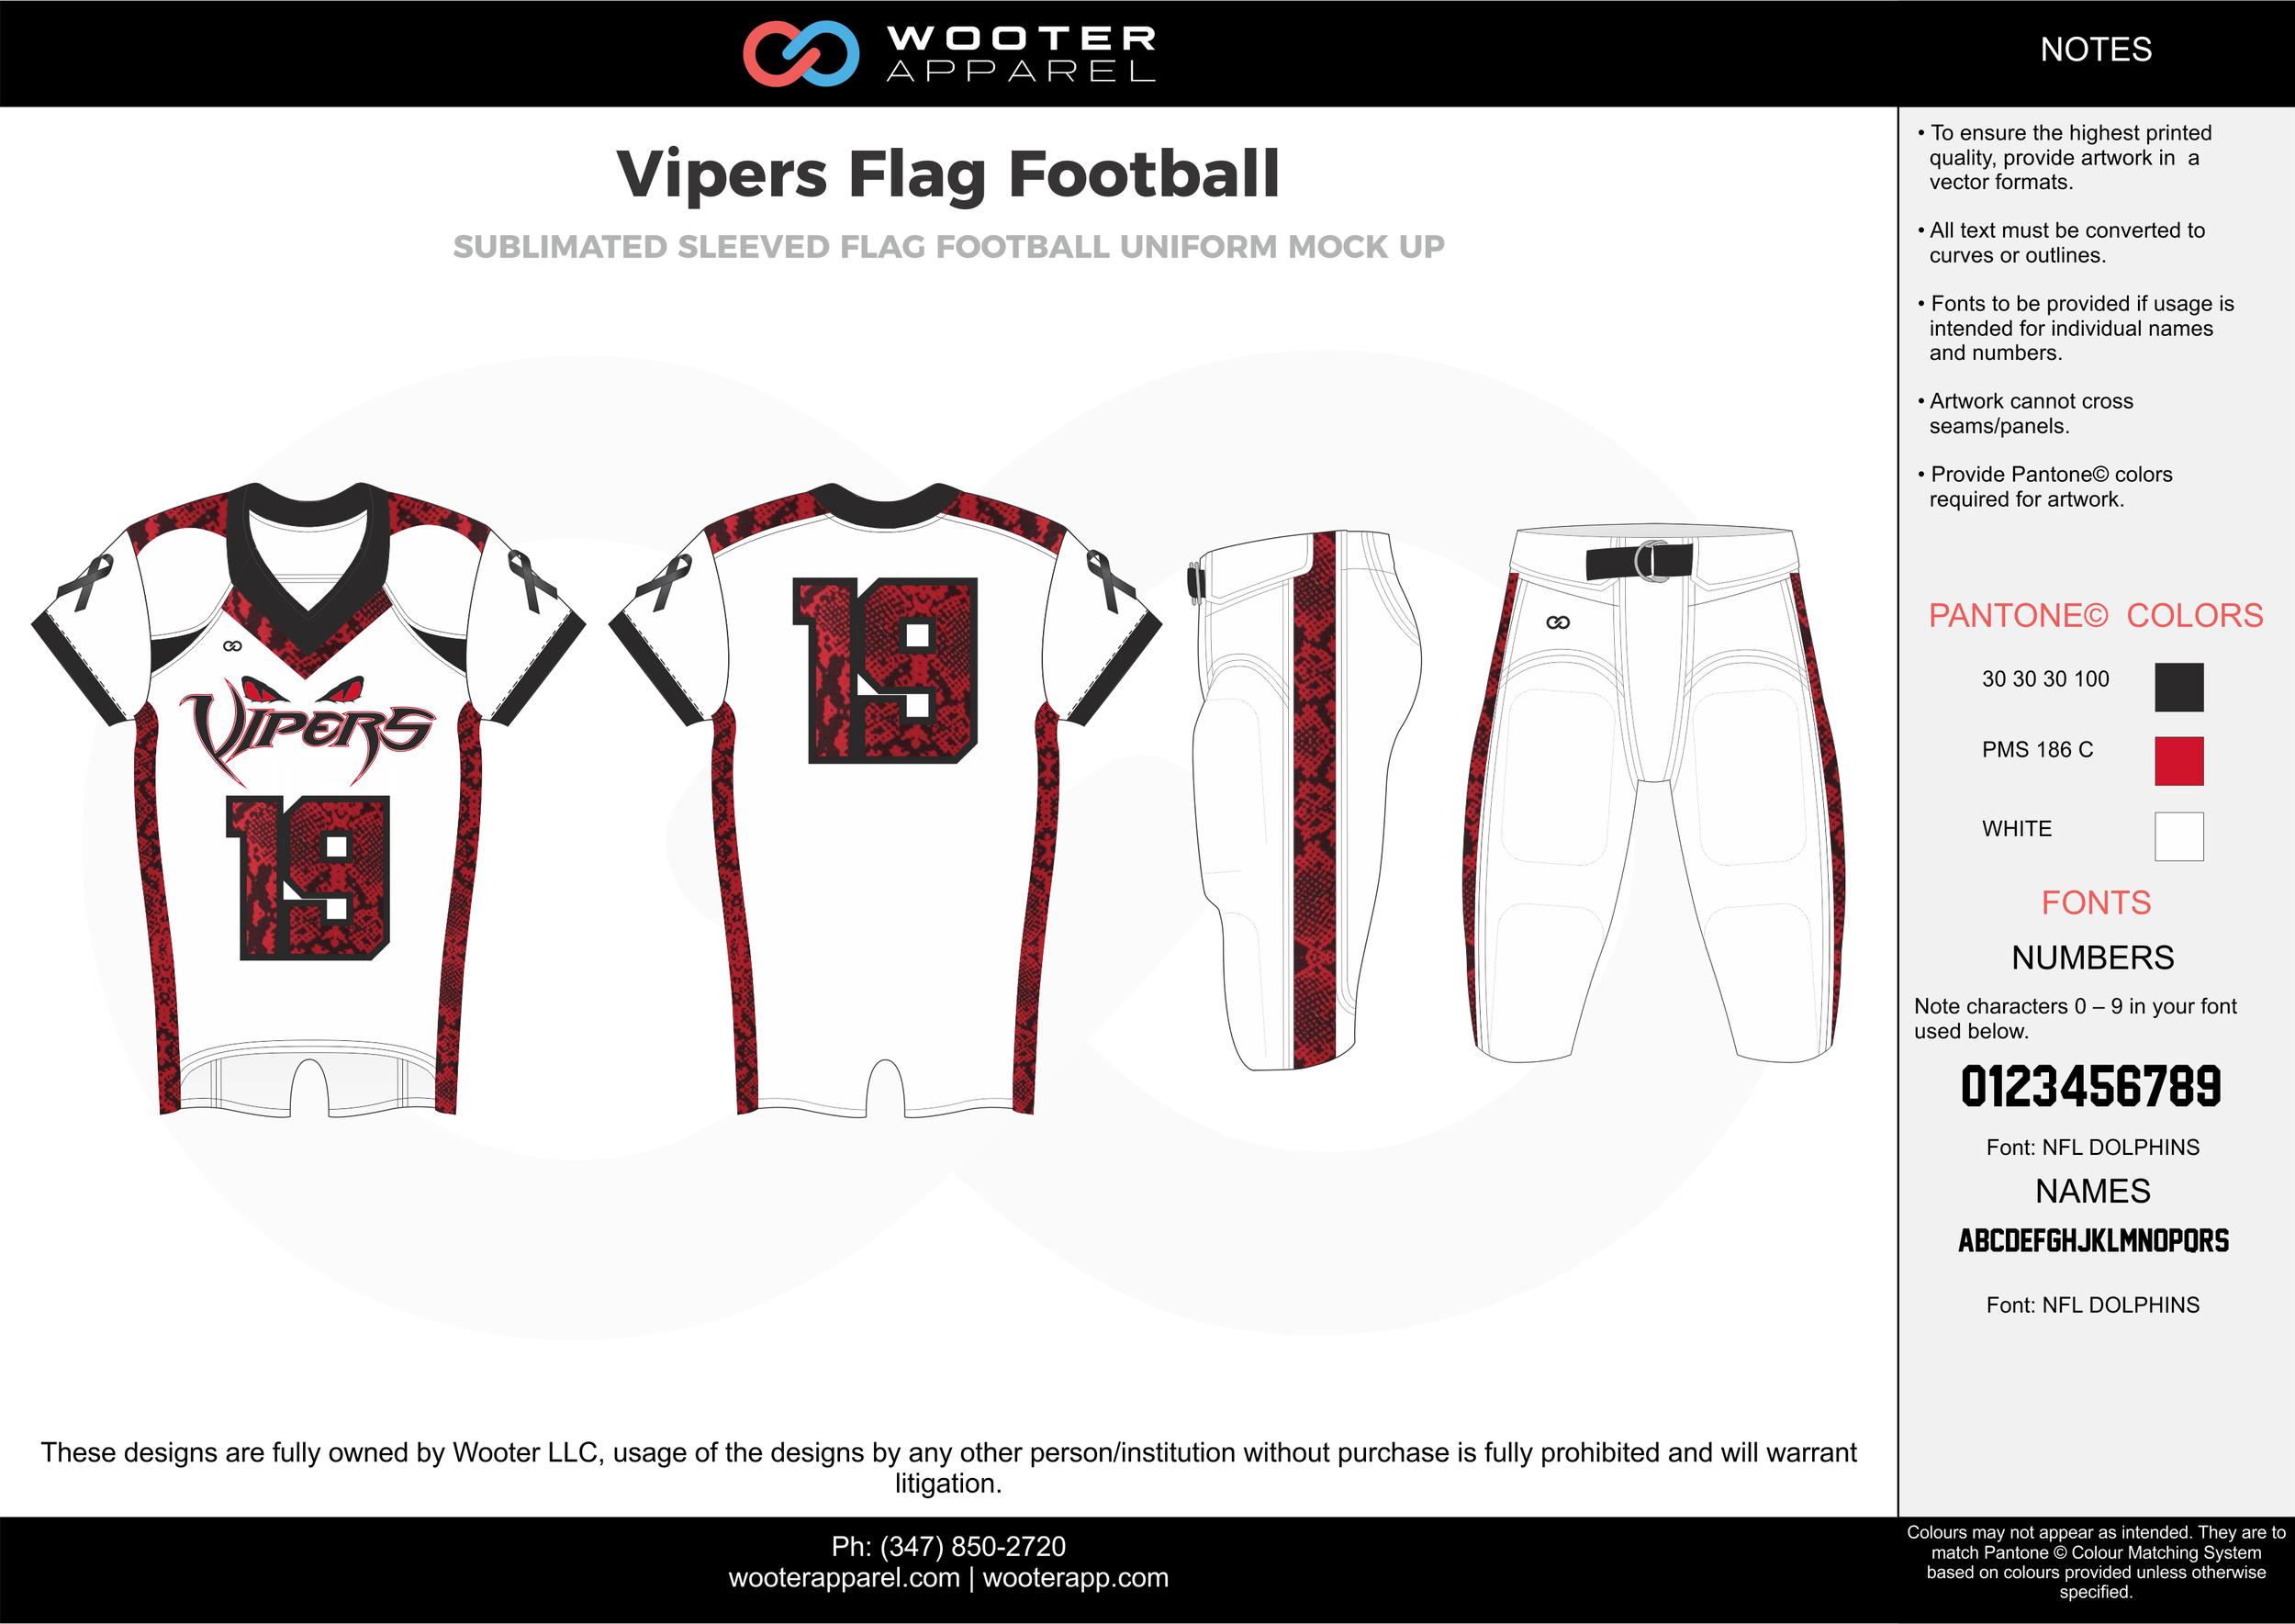 VIPERS Flag Football white maroon flag football uniforms jerseys pants